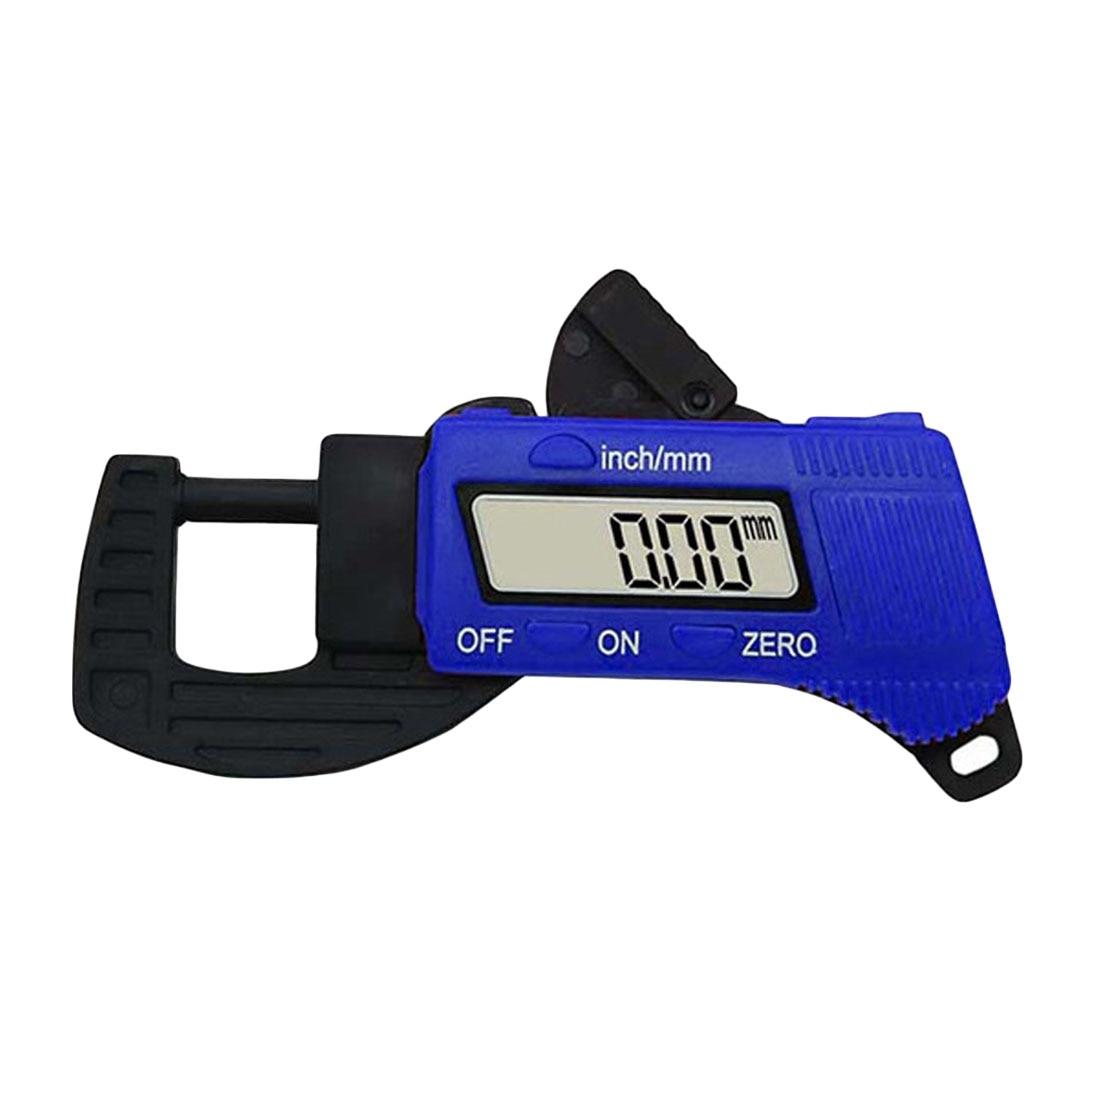 1pcs Digital Thickness Gauge 0.01mm Mini Dial Thickness Gauges Meter Carbon Fiber Composite Meter Width Measurement Tools Bule